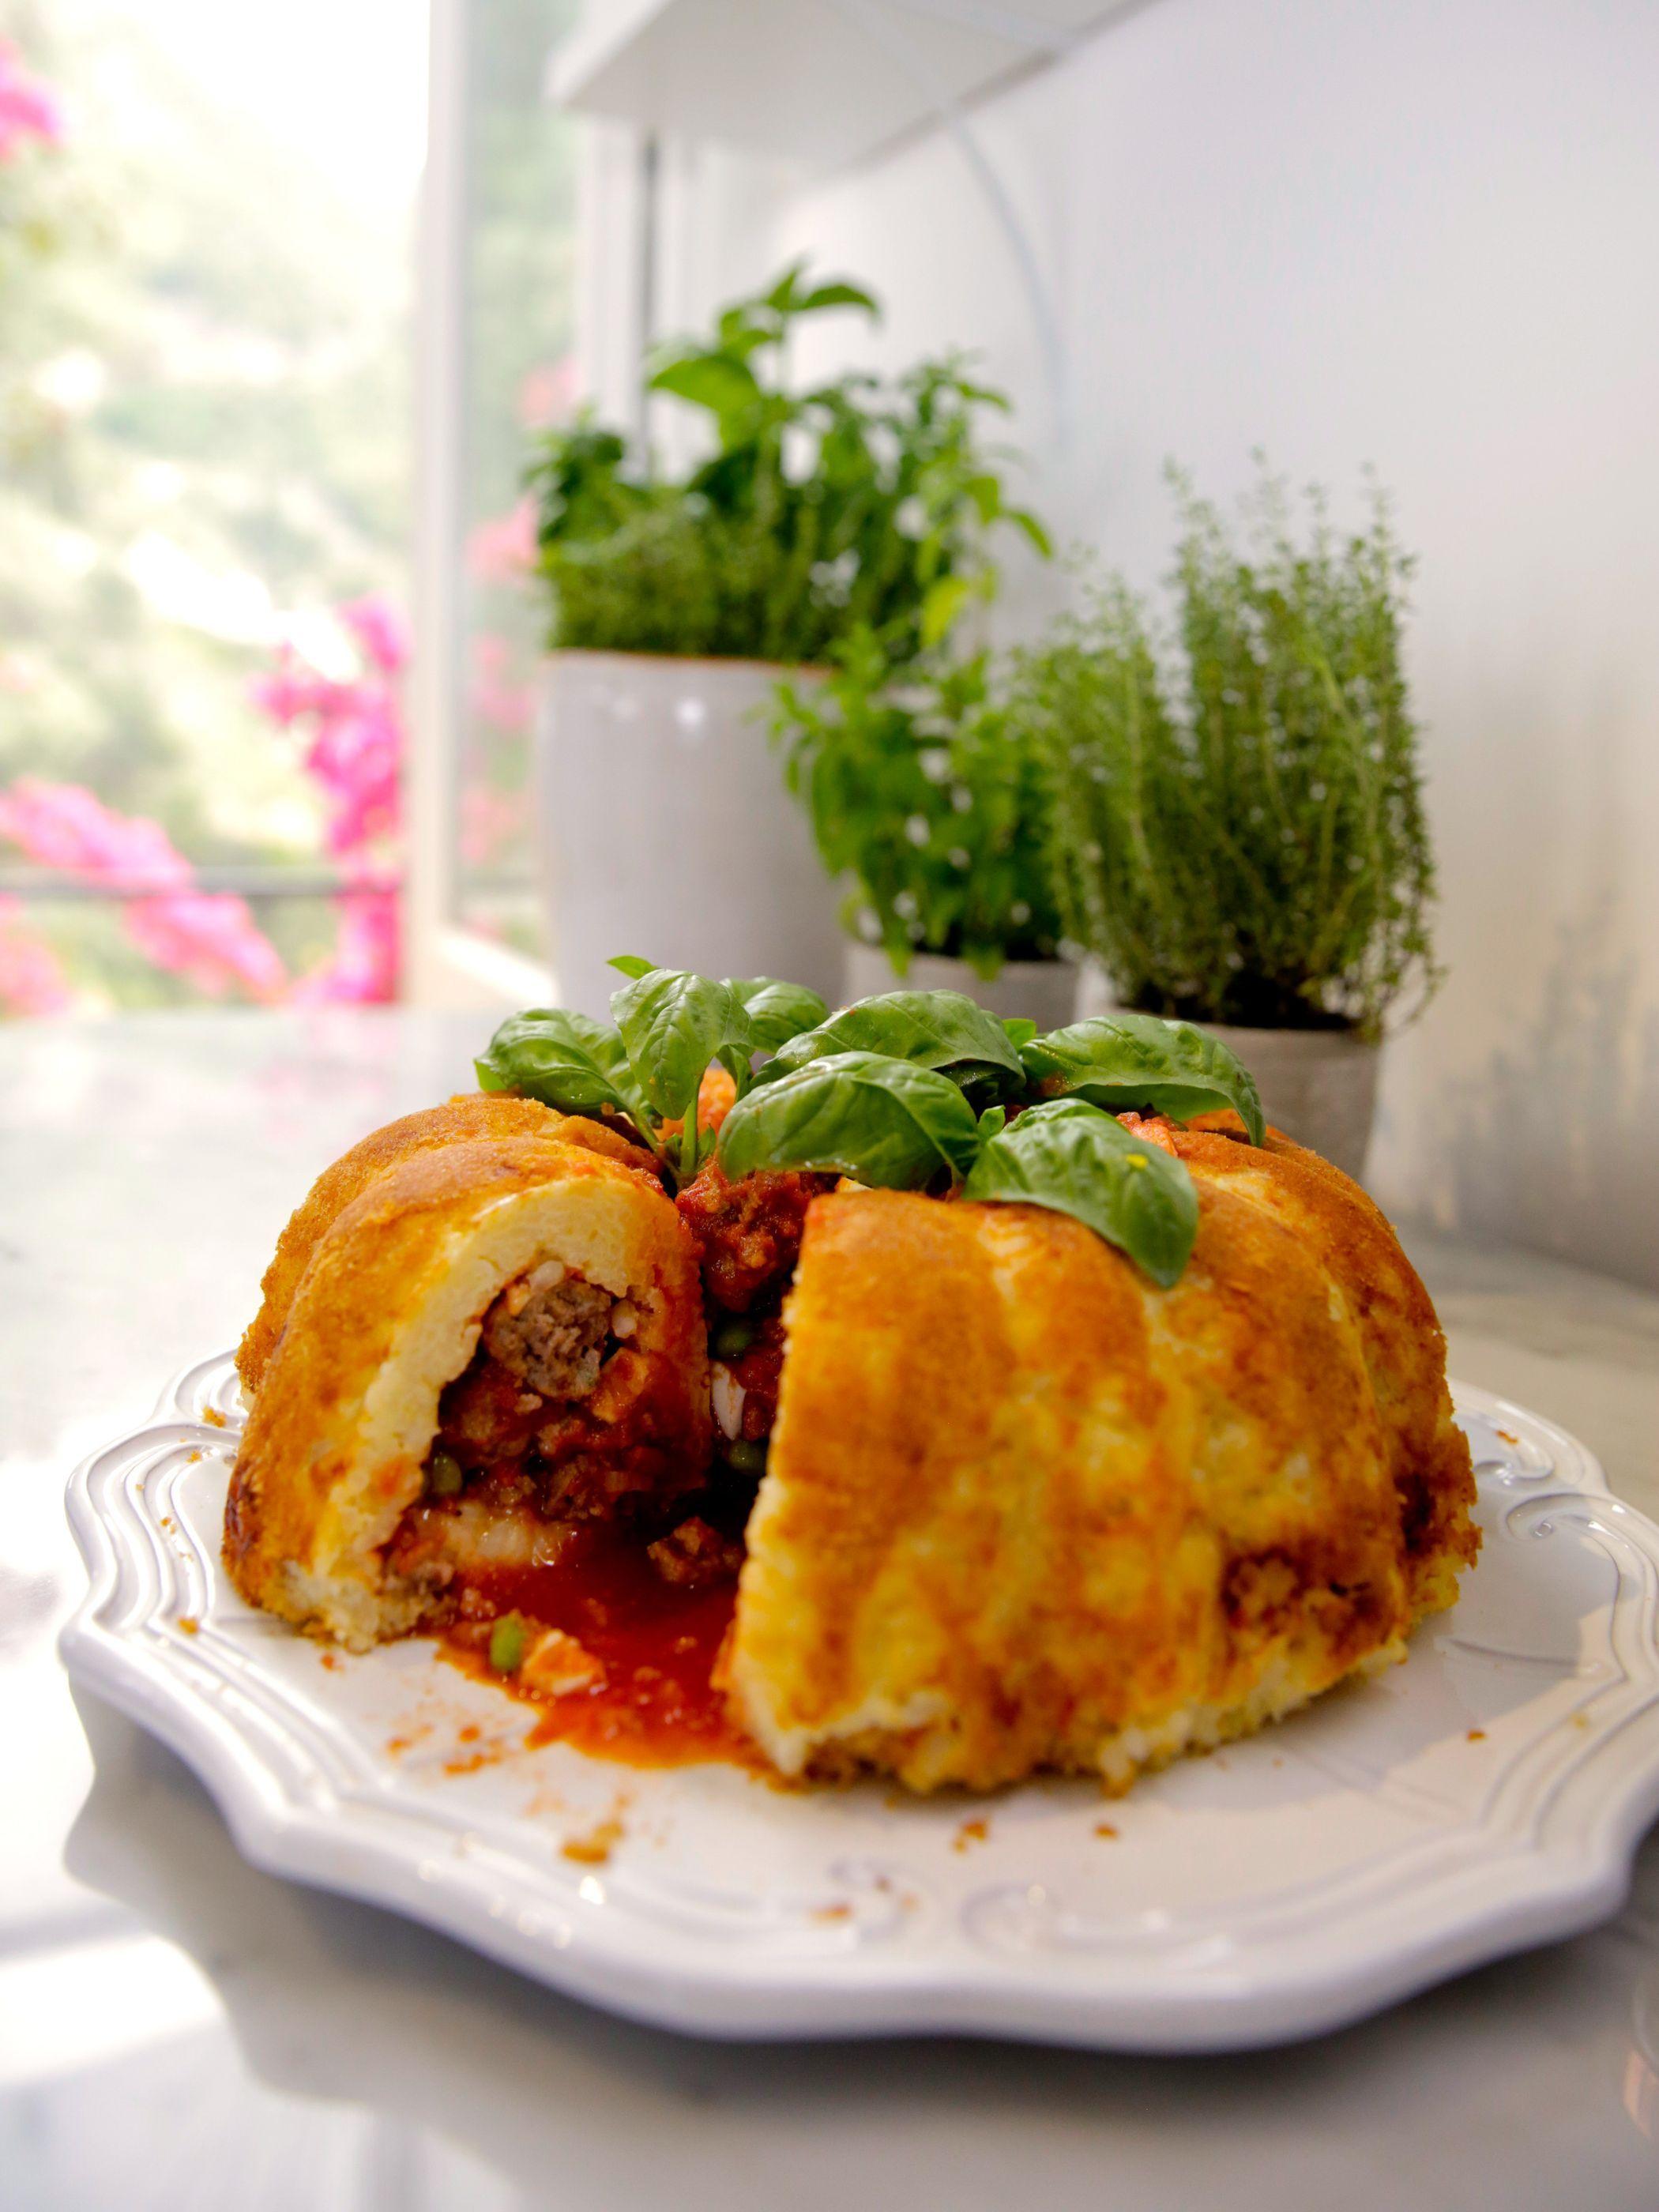 stuffed mushrooms recipe giada de laurentiis food network - 616×822